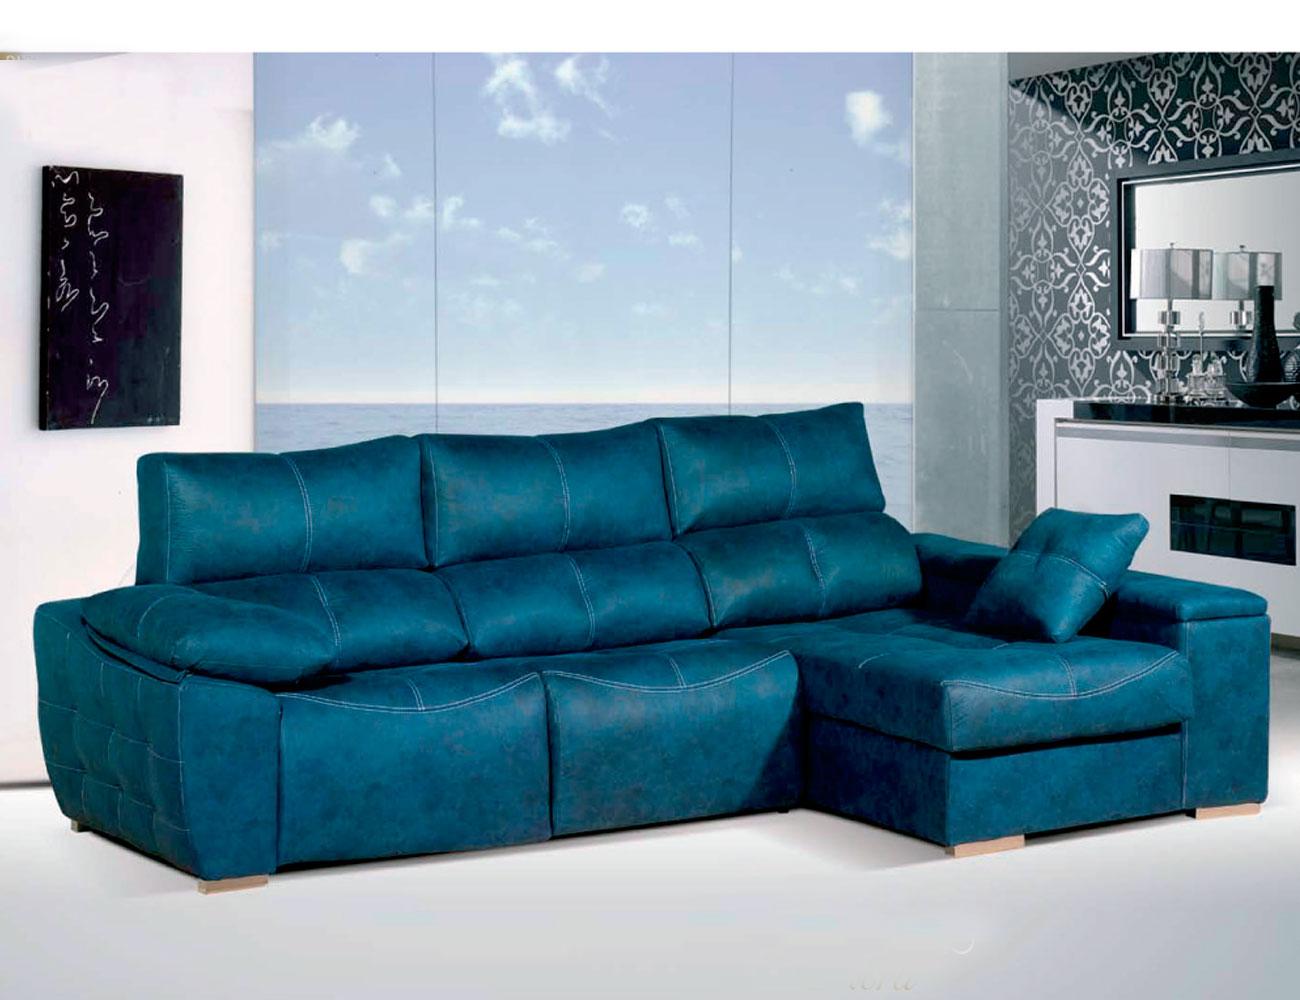 Sofa chaiselongue relax 2 motores anti manchas turquesa42